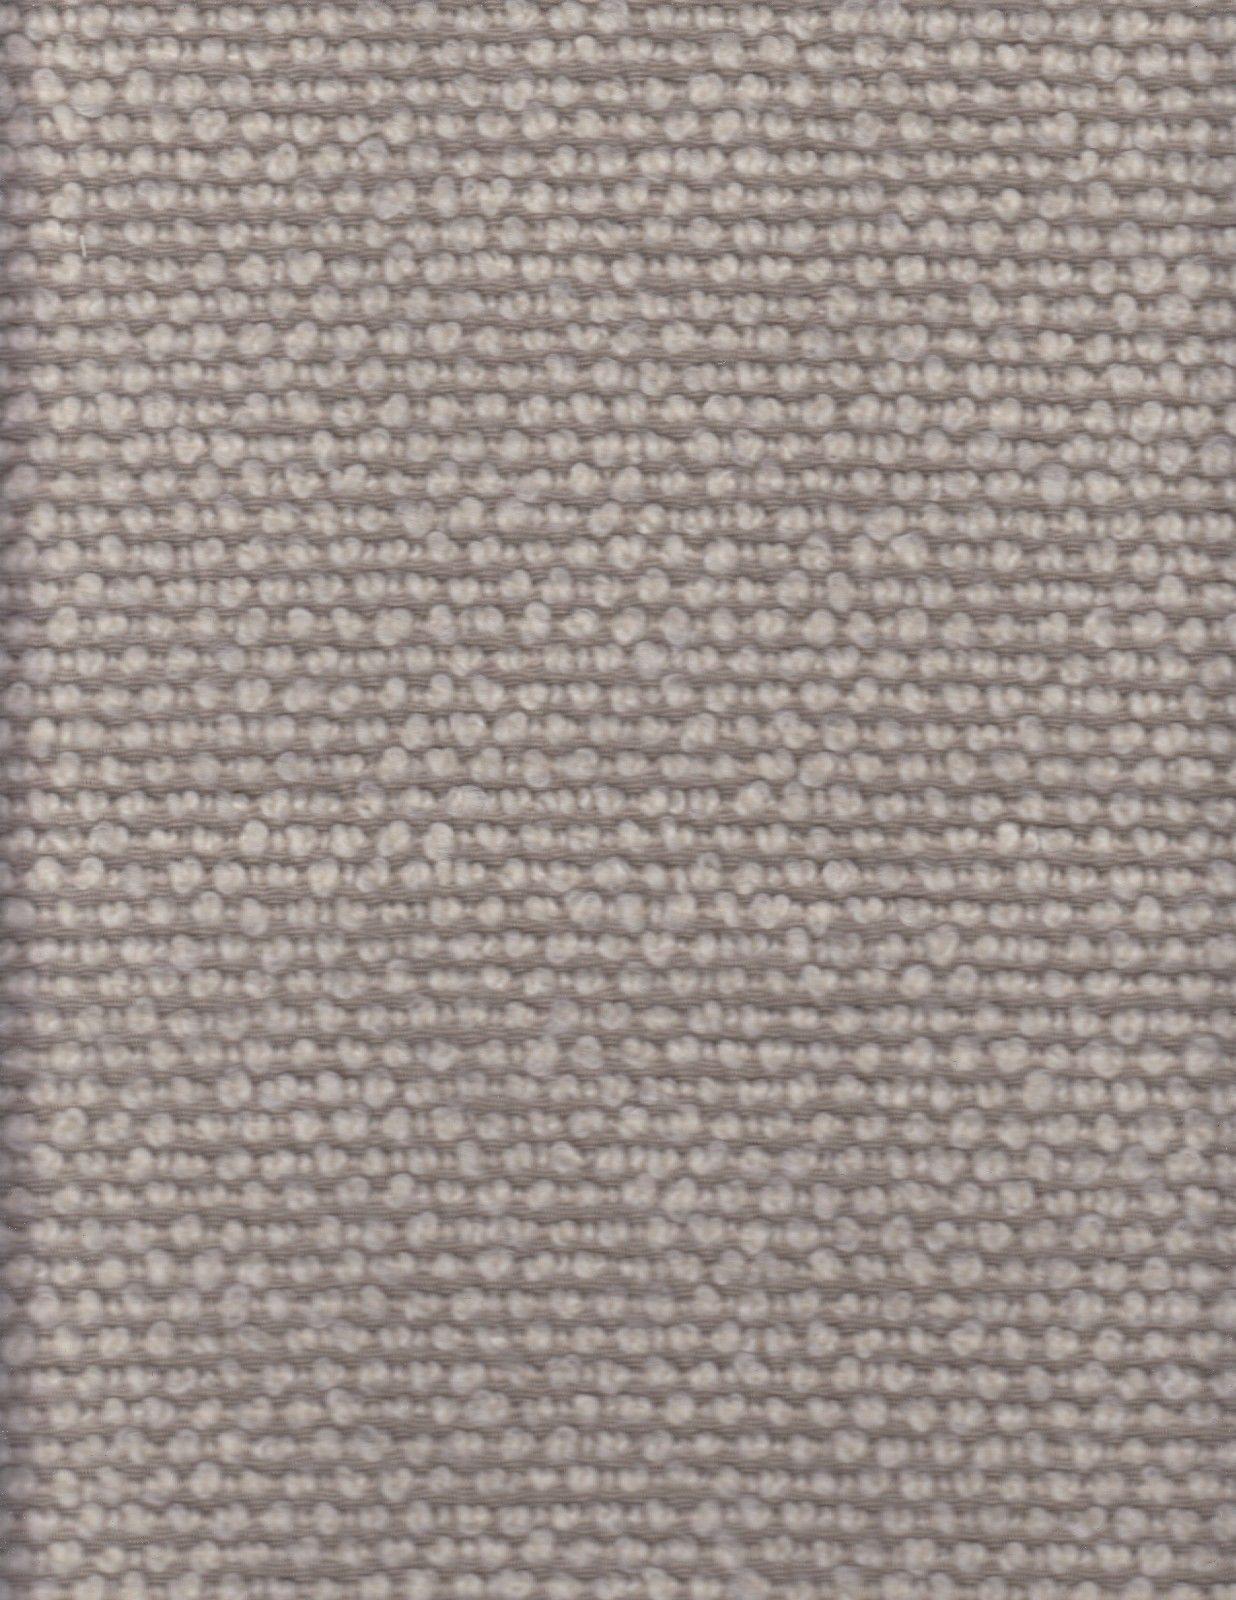 7.75 yds Bernhardt Upholstery Fabric MCM Muse Nubby Wool 3454-002 Dune RT